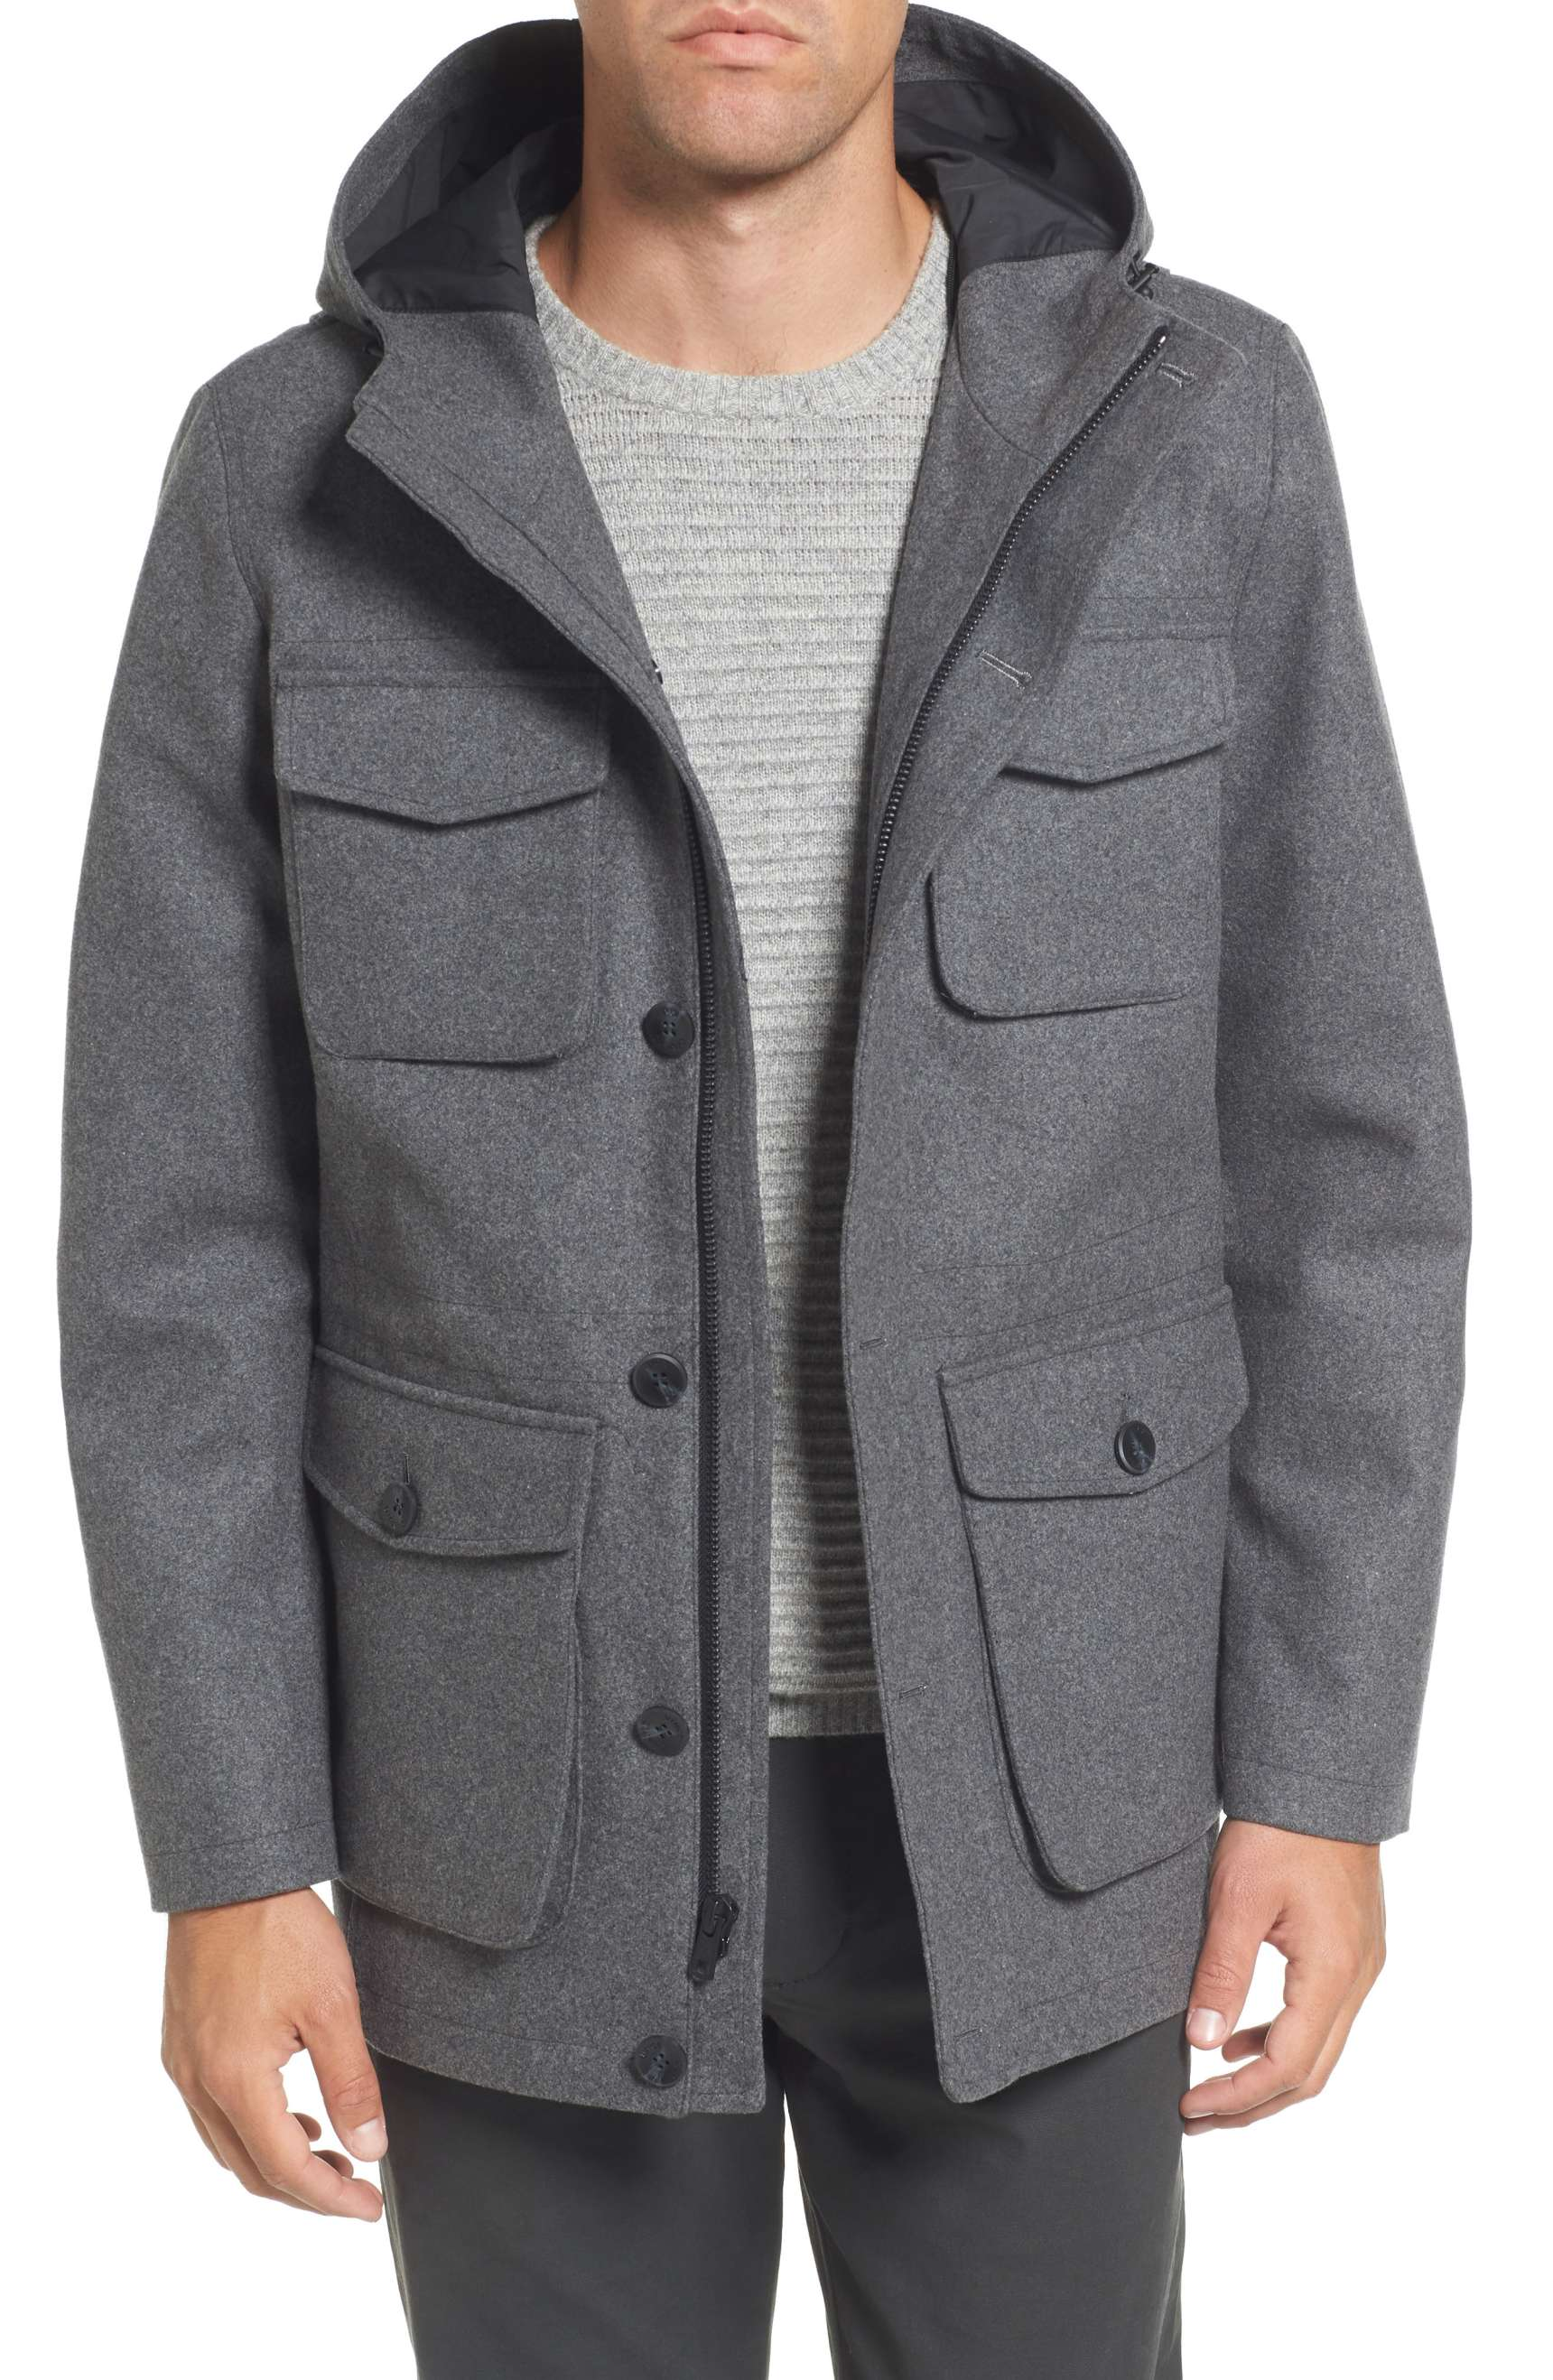 winter coats for men best mens winter coats 2018: vince camuto hooded jacket xmeljol